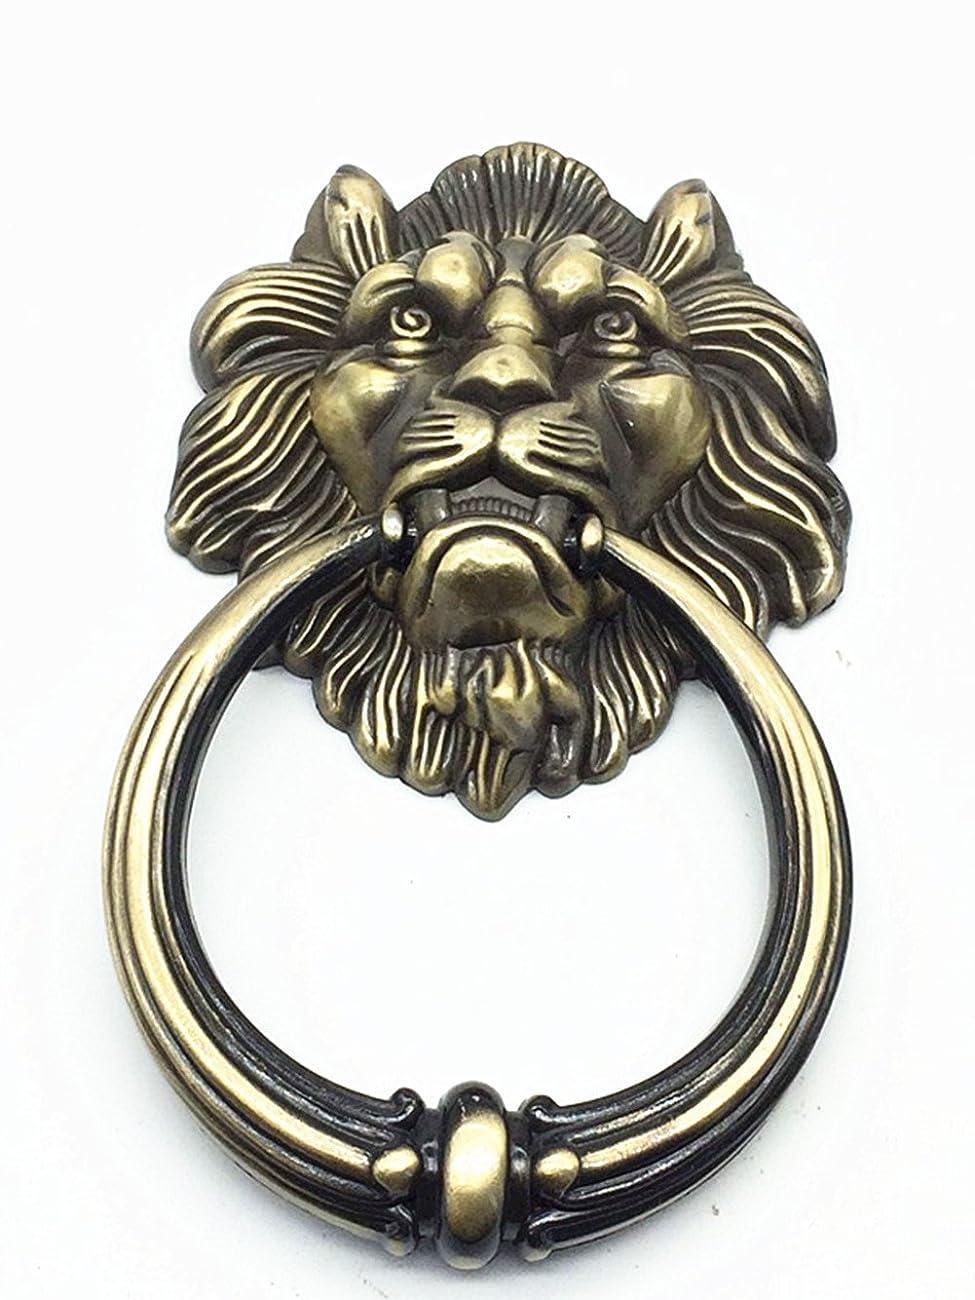 UniDecor Large Antique Lion Door Knocker Lion Head Door Handle 1